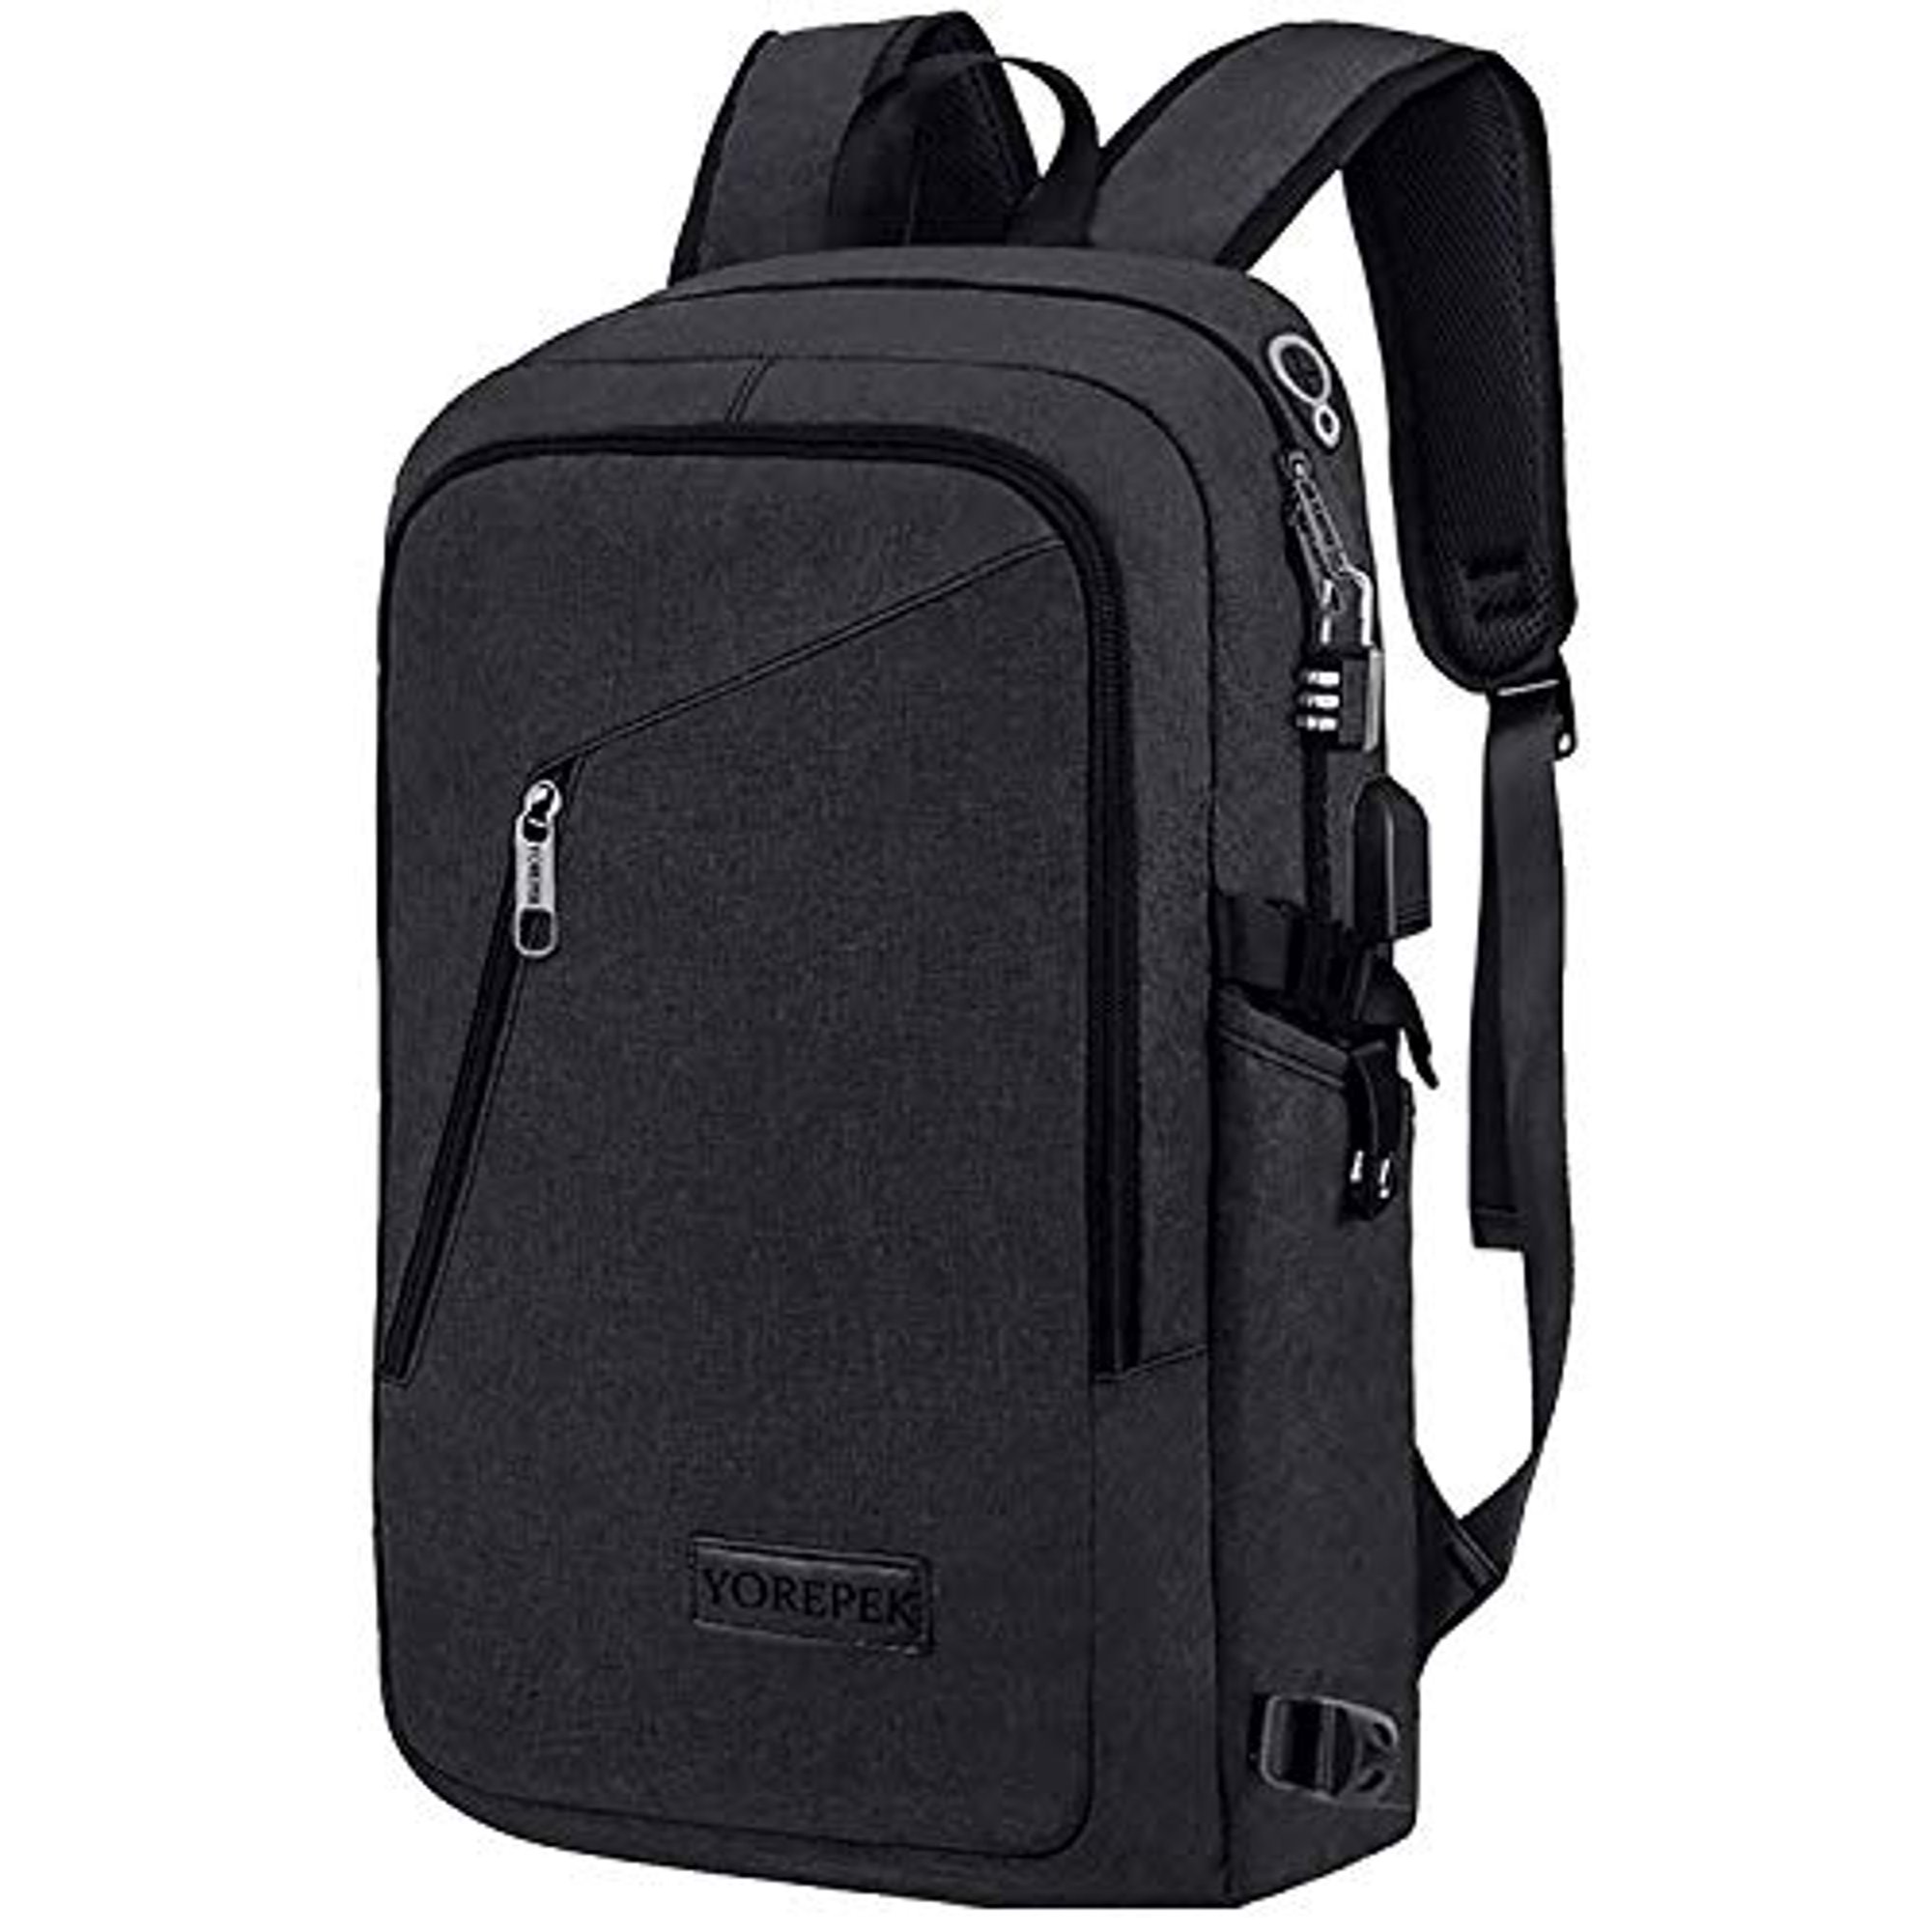 1c0fb157e751 Yorepek Slim Laptop Backpack, Business Computer Backpack w USB ...